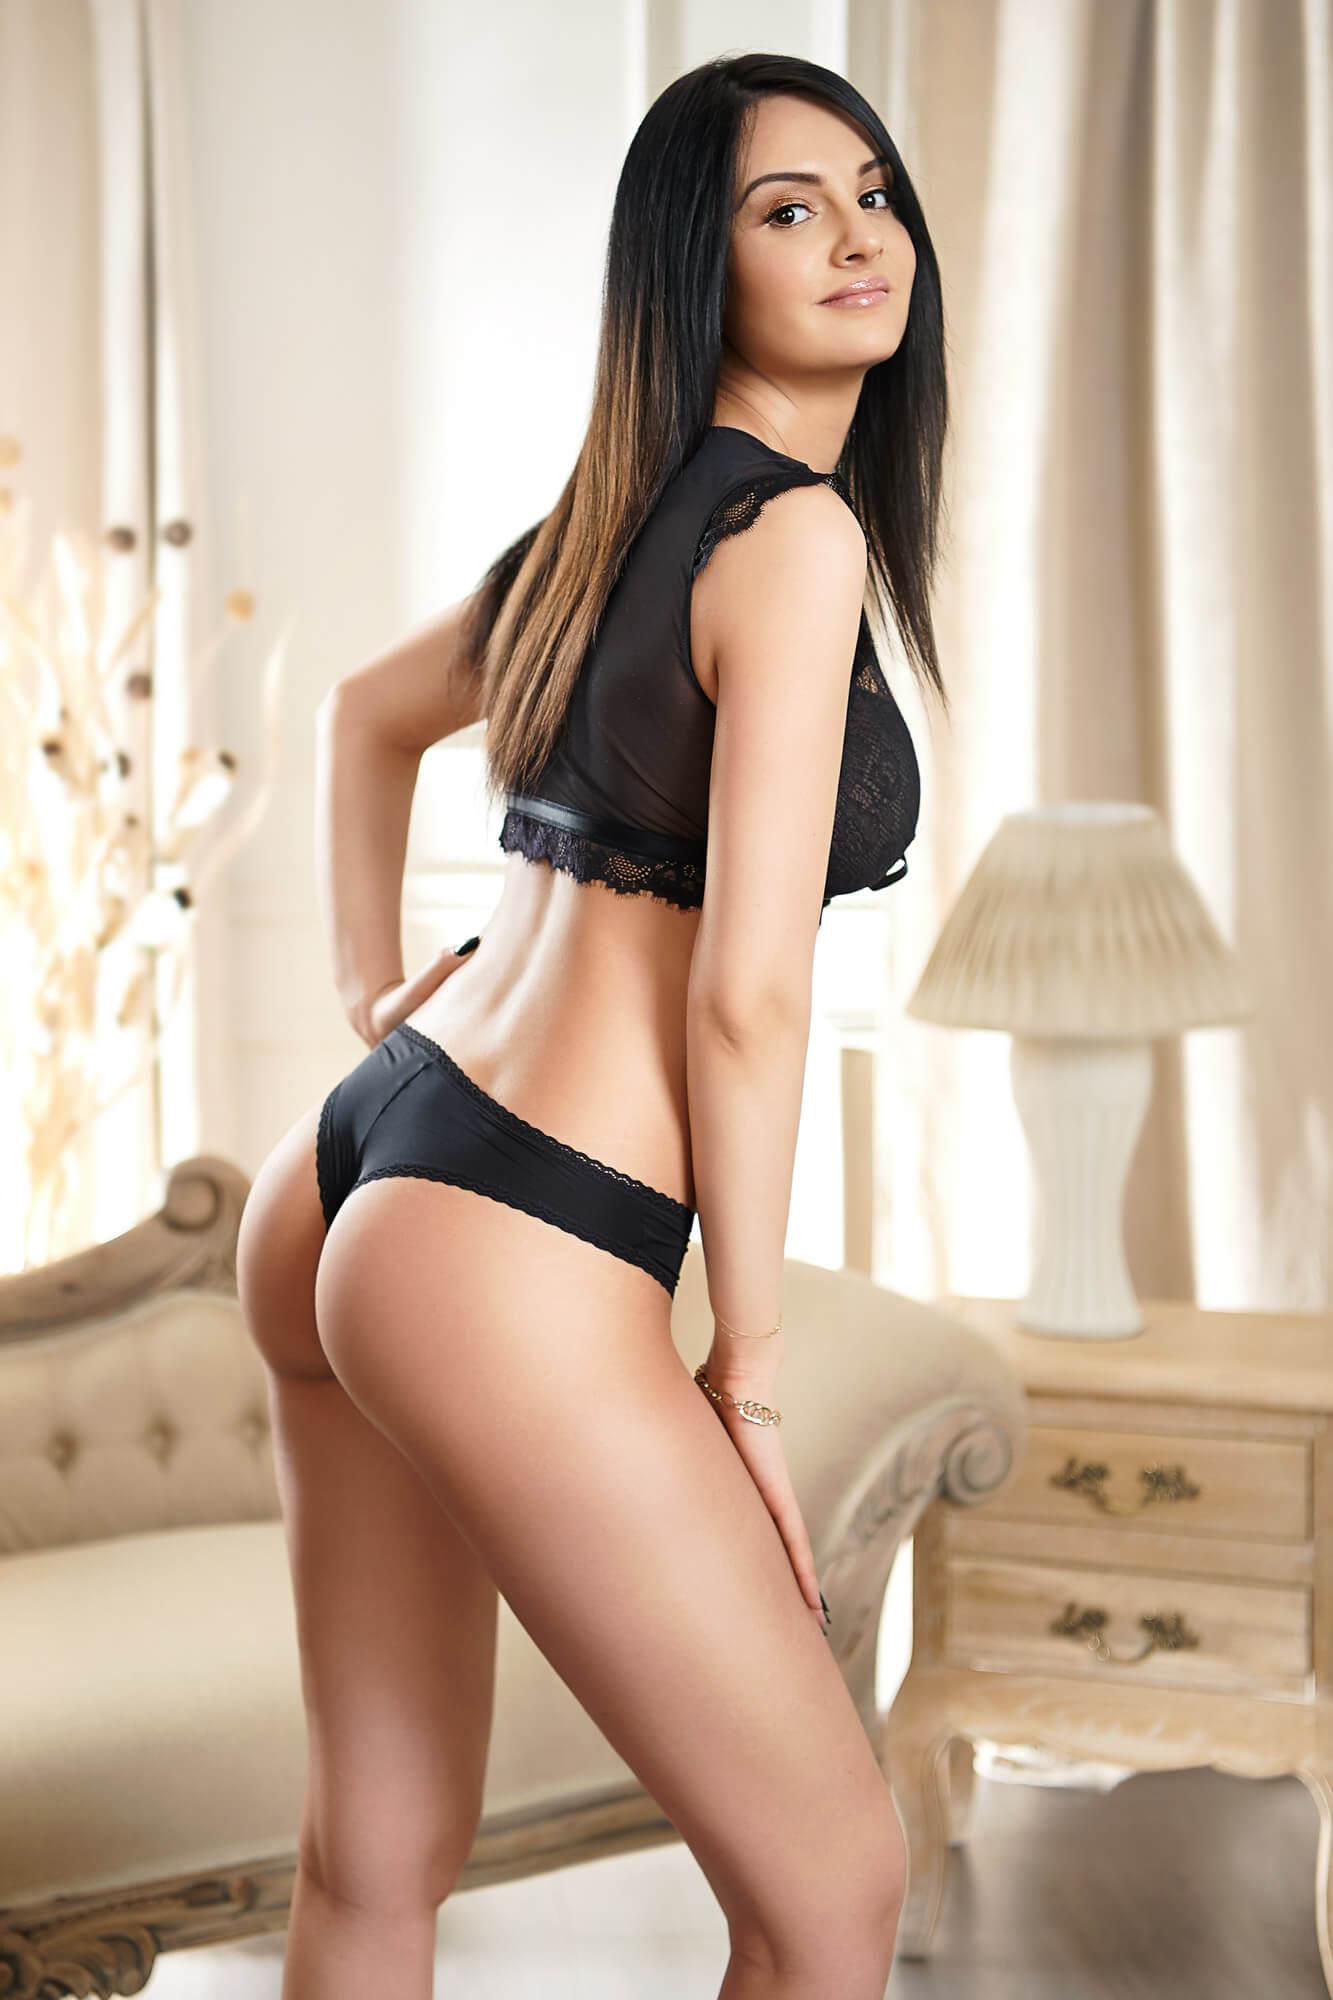 skinny tall young brunette 24c london escort marina (4)